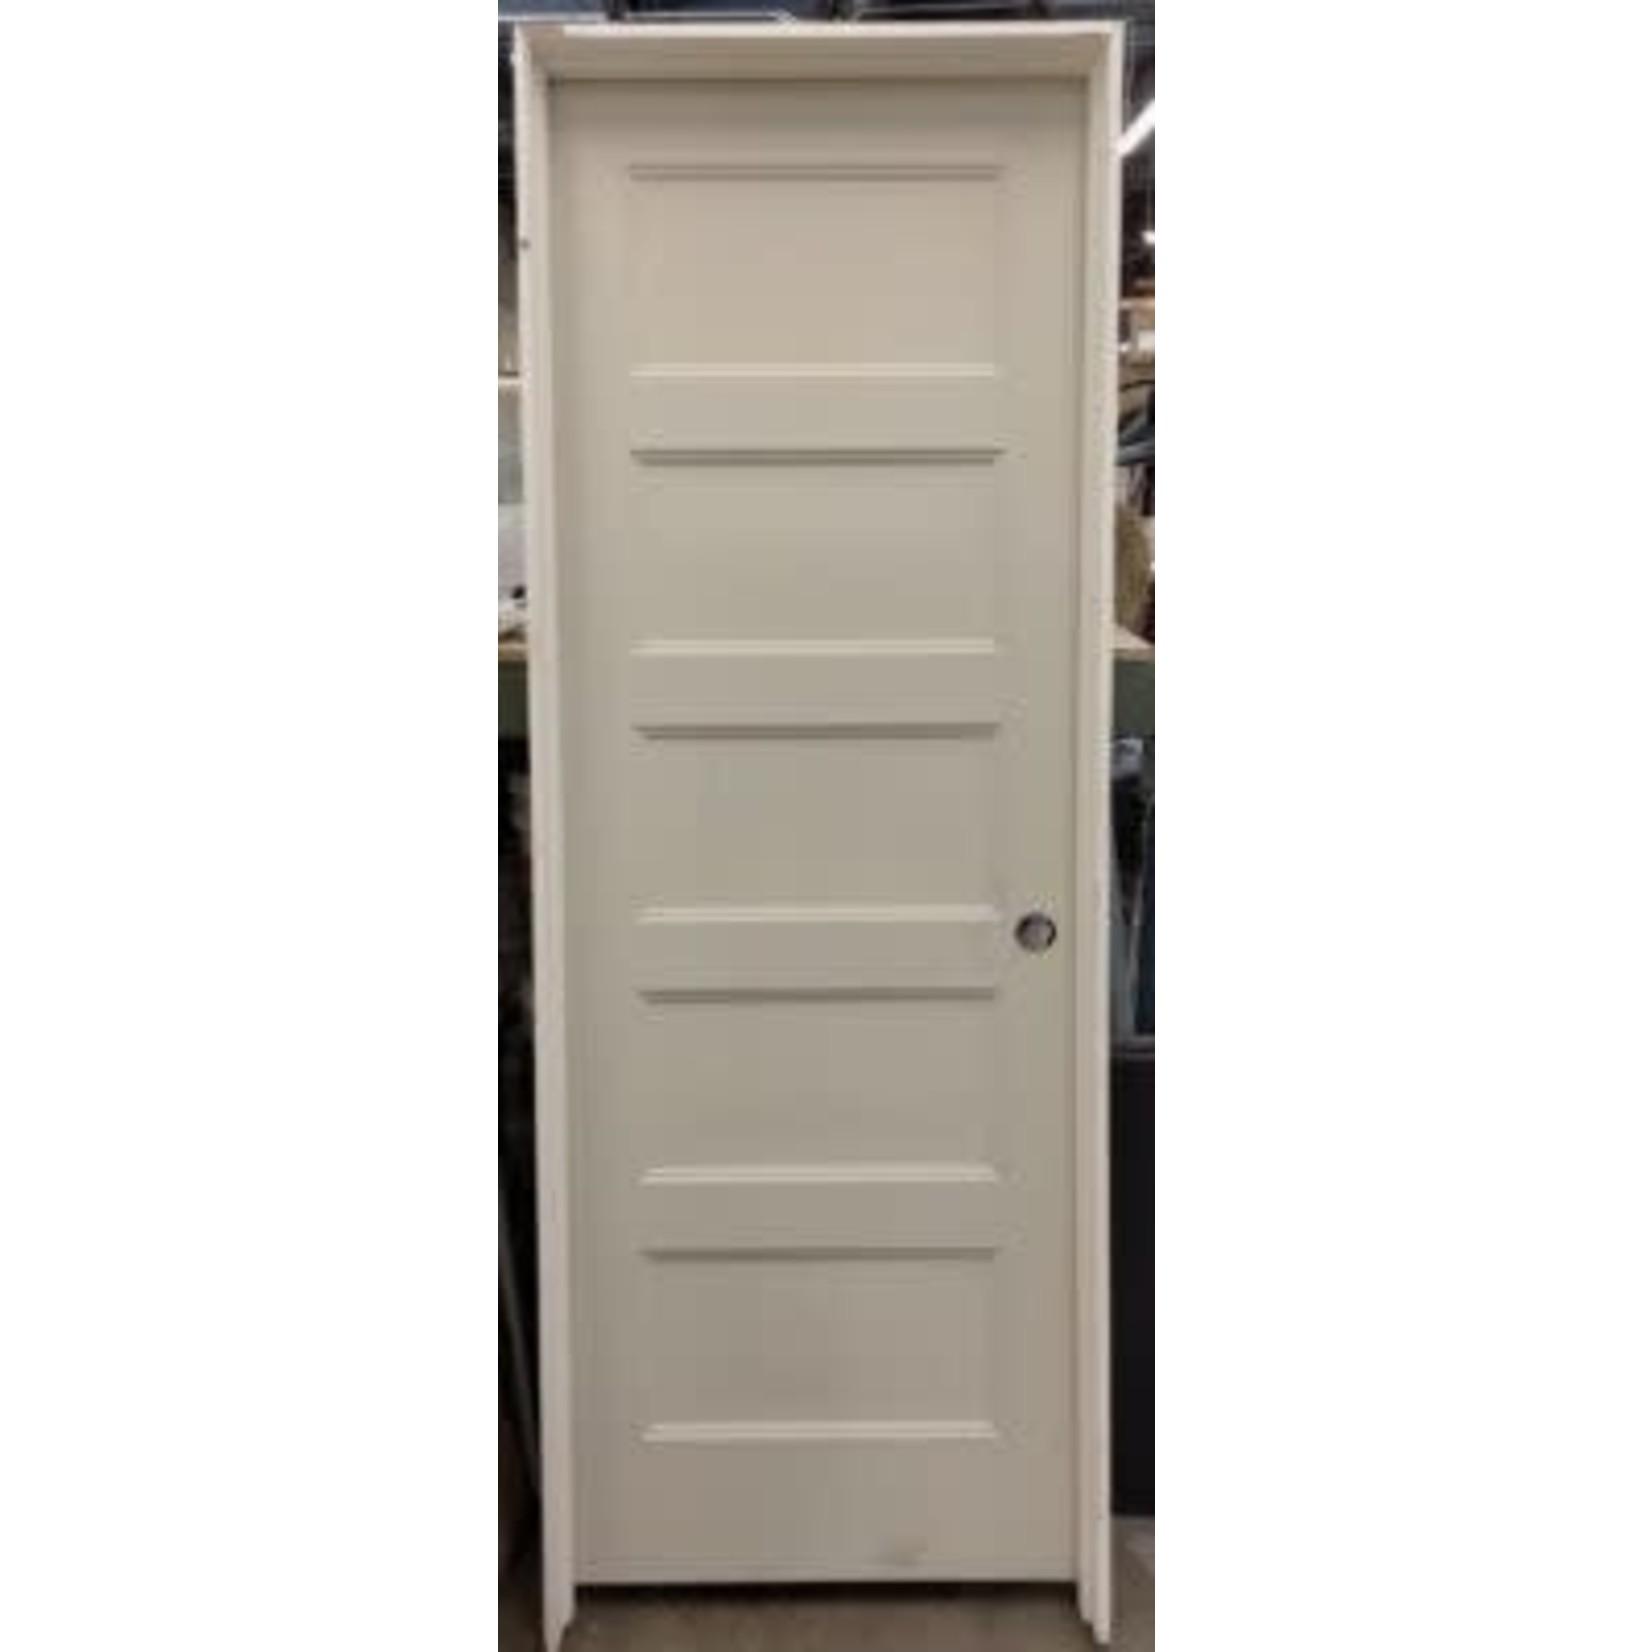 4072 Primed Pre-Hung Recessed 5-Panel Interior Door